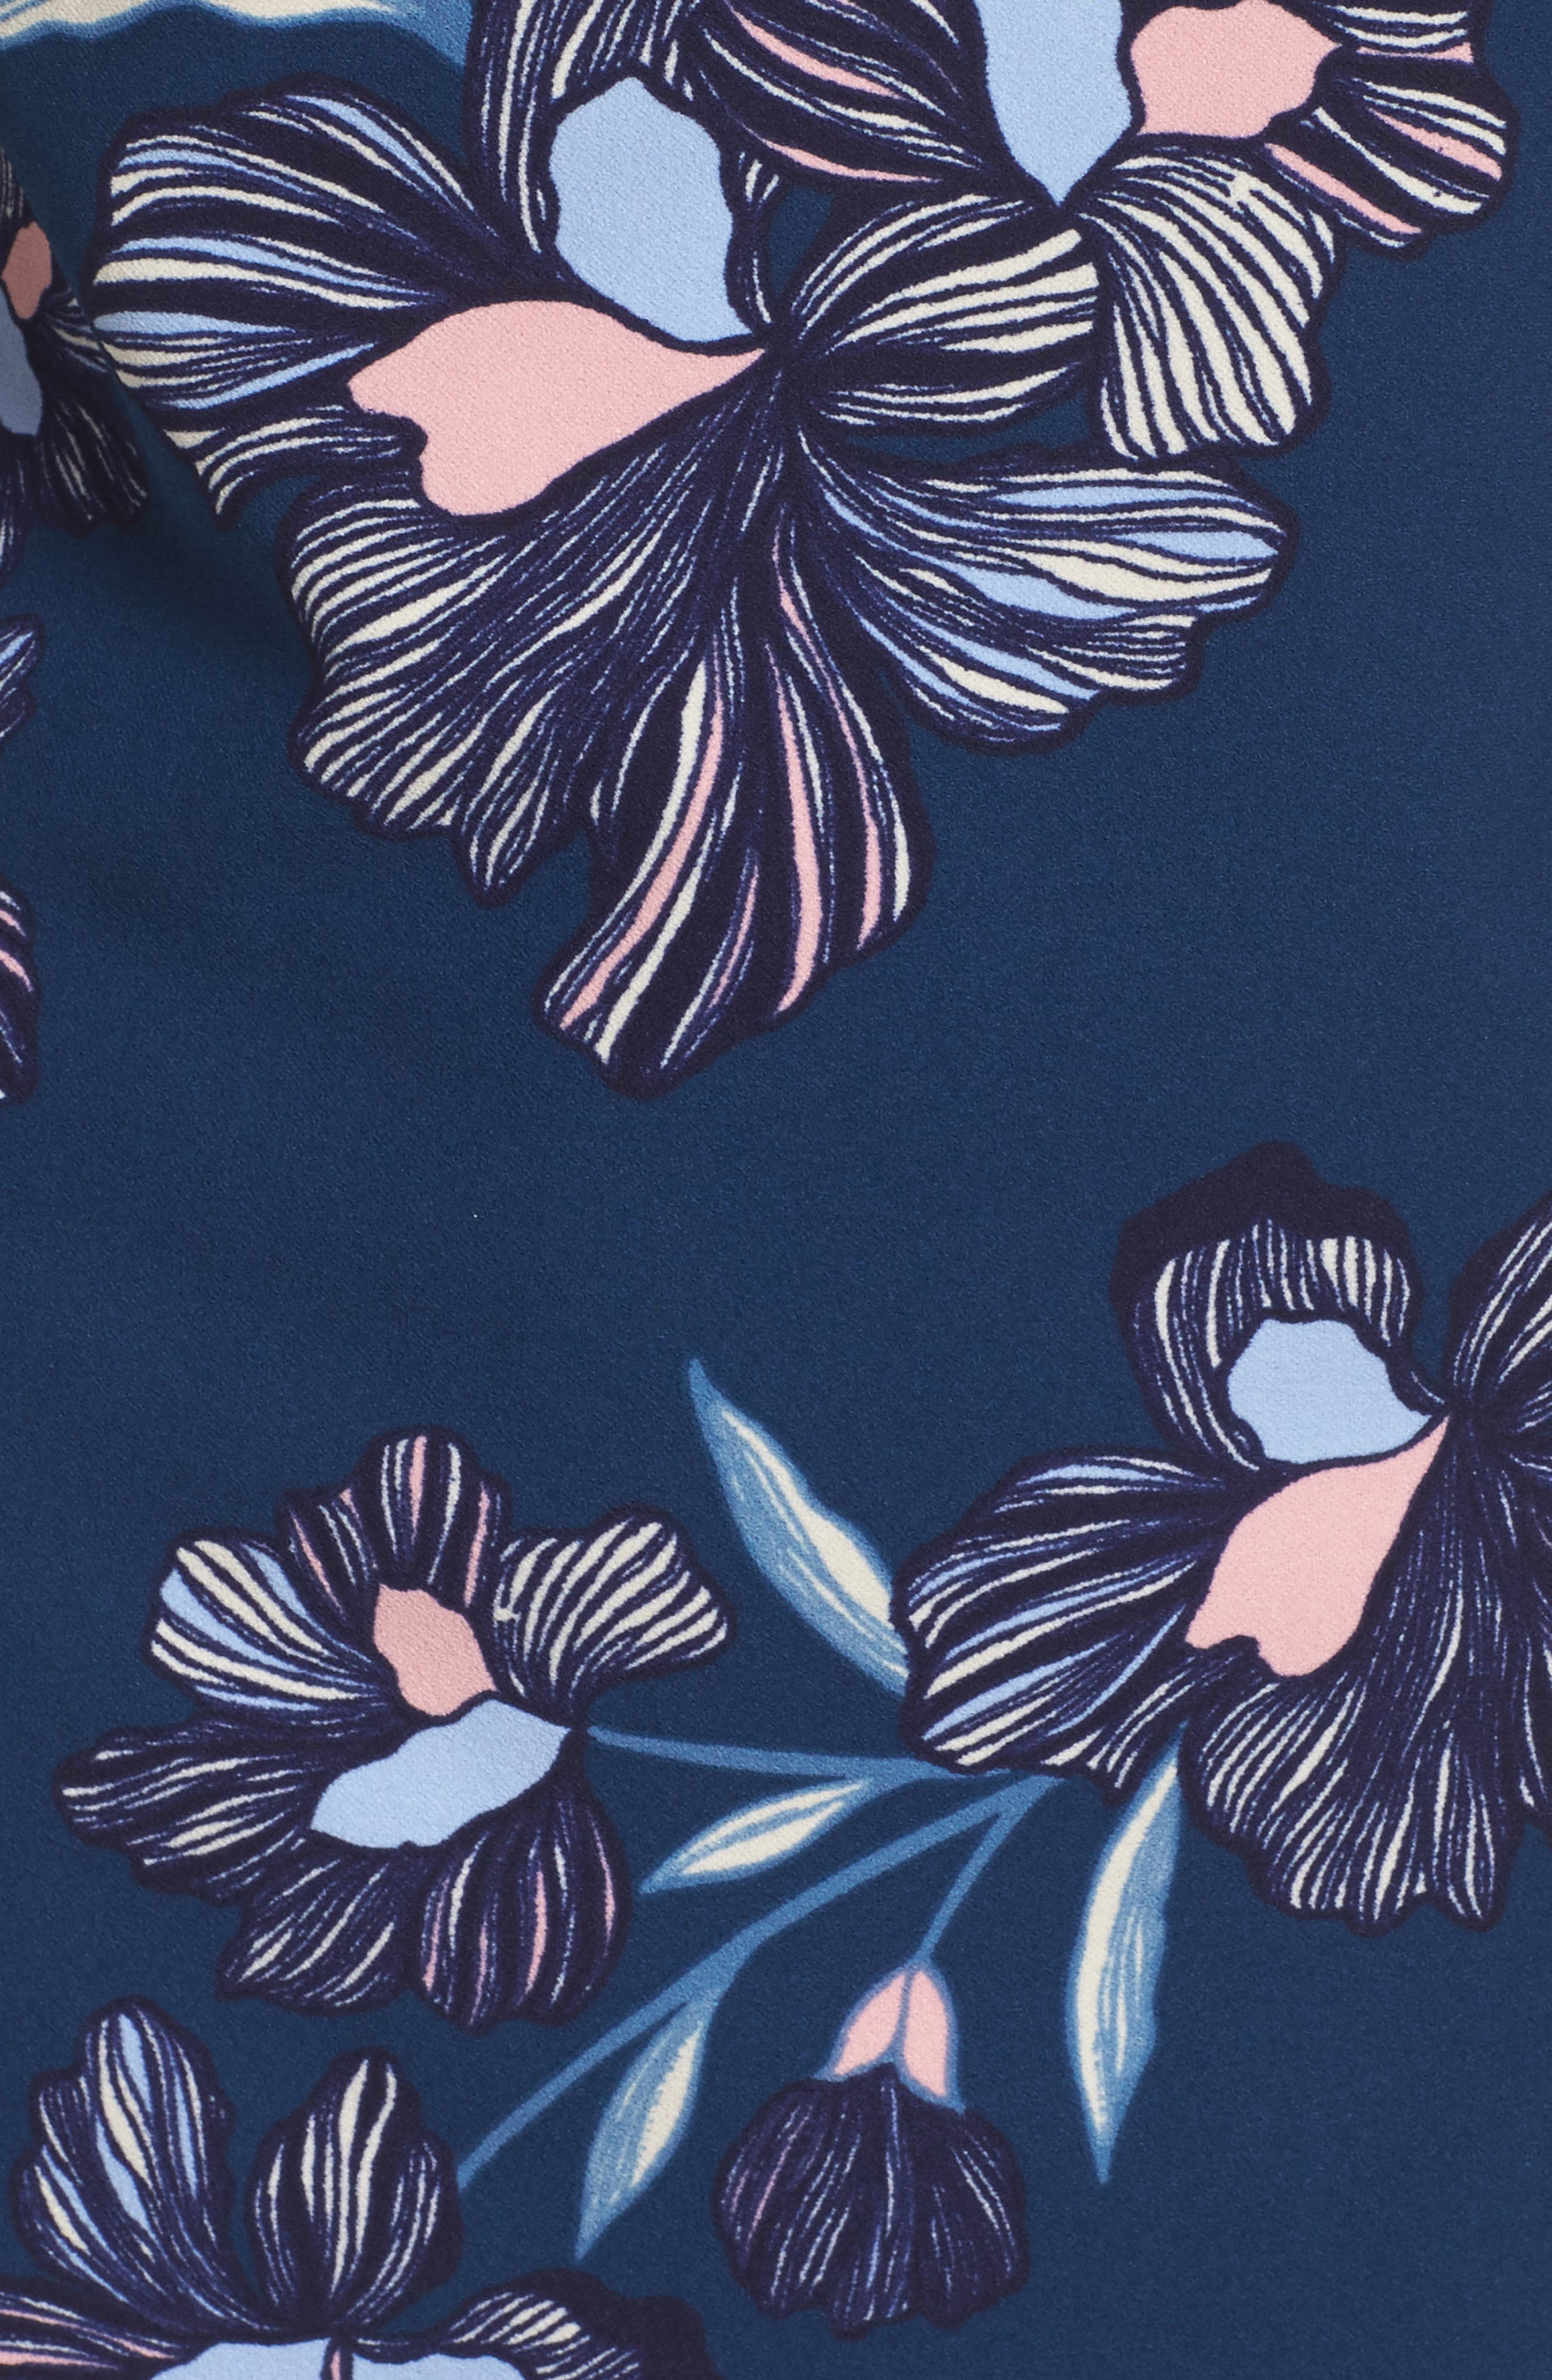 Floral Print Crepe Shift Dress,                             Alternate thumbnail 5, color,                             410